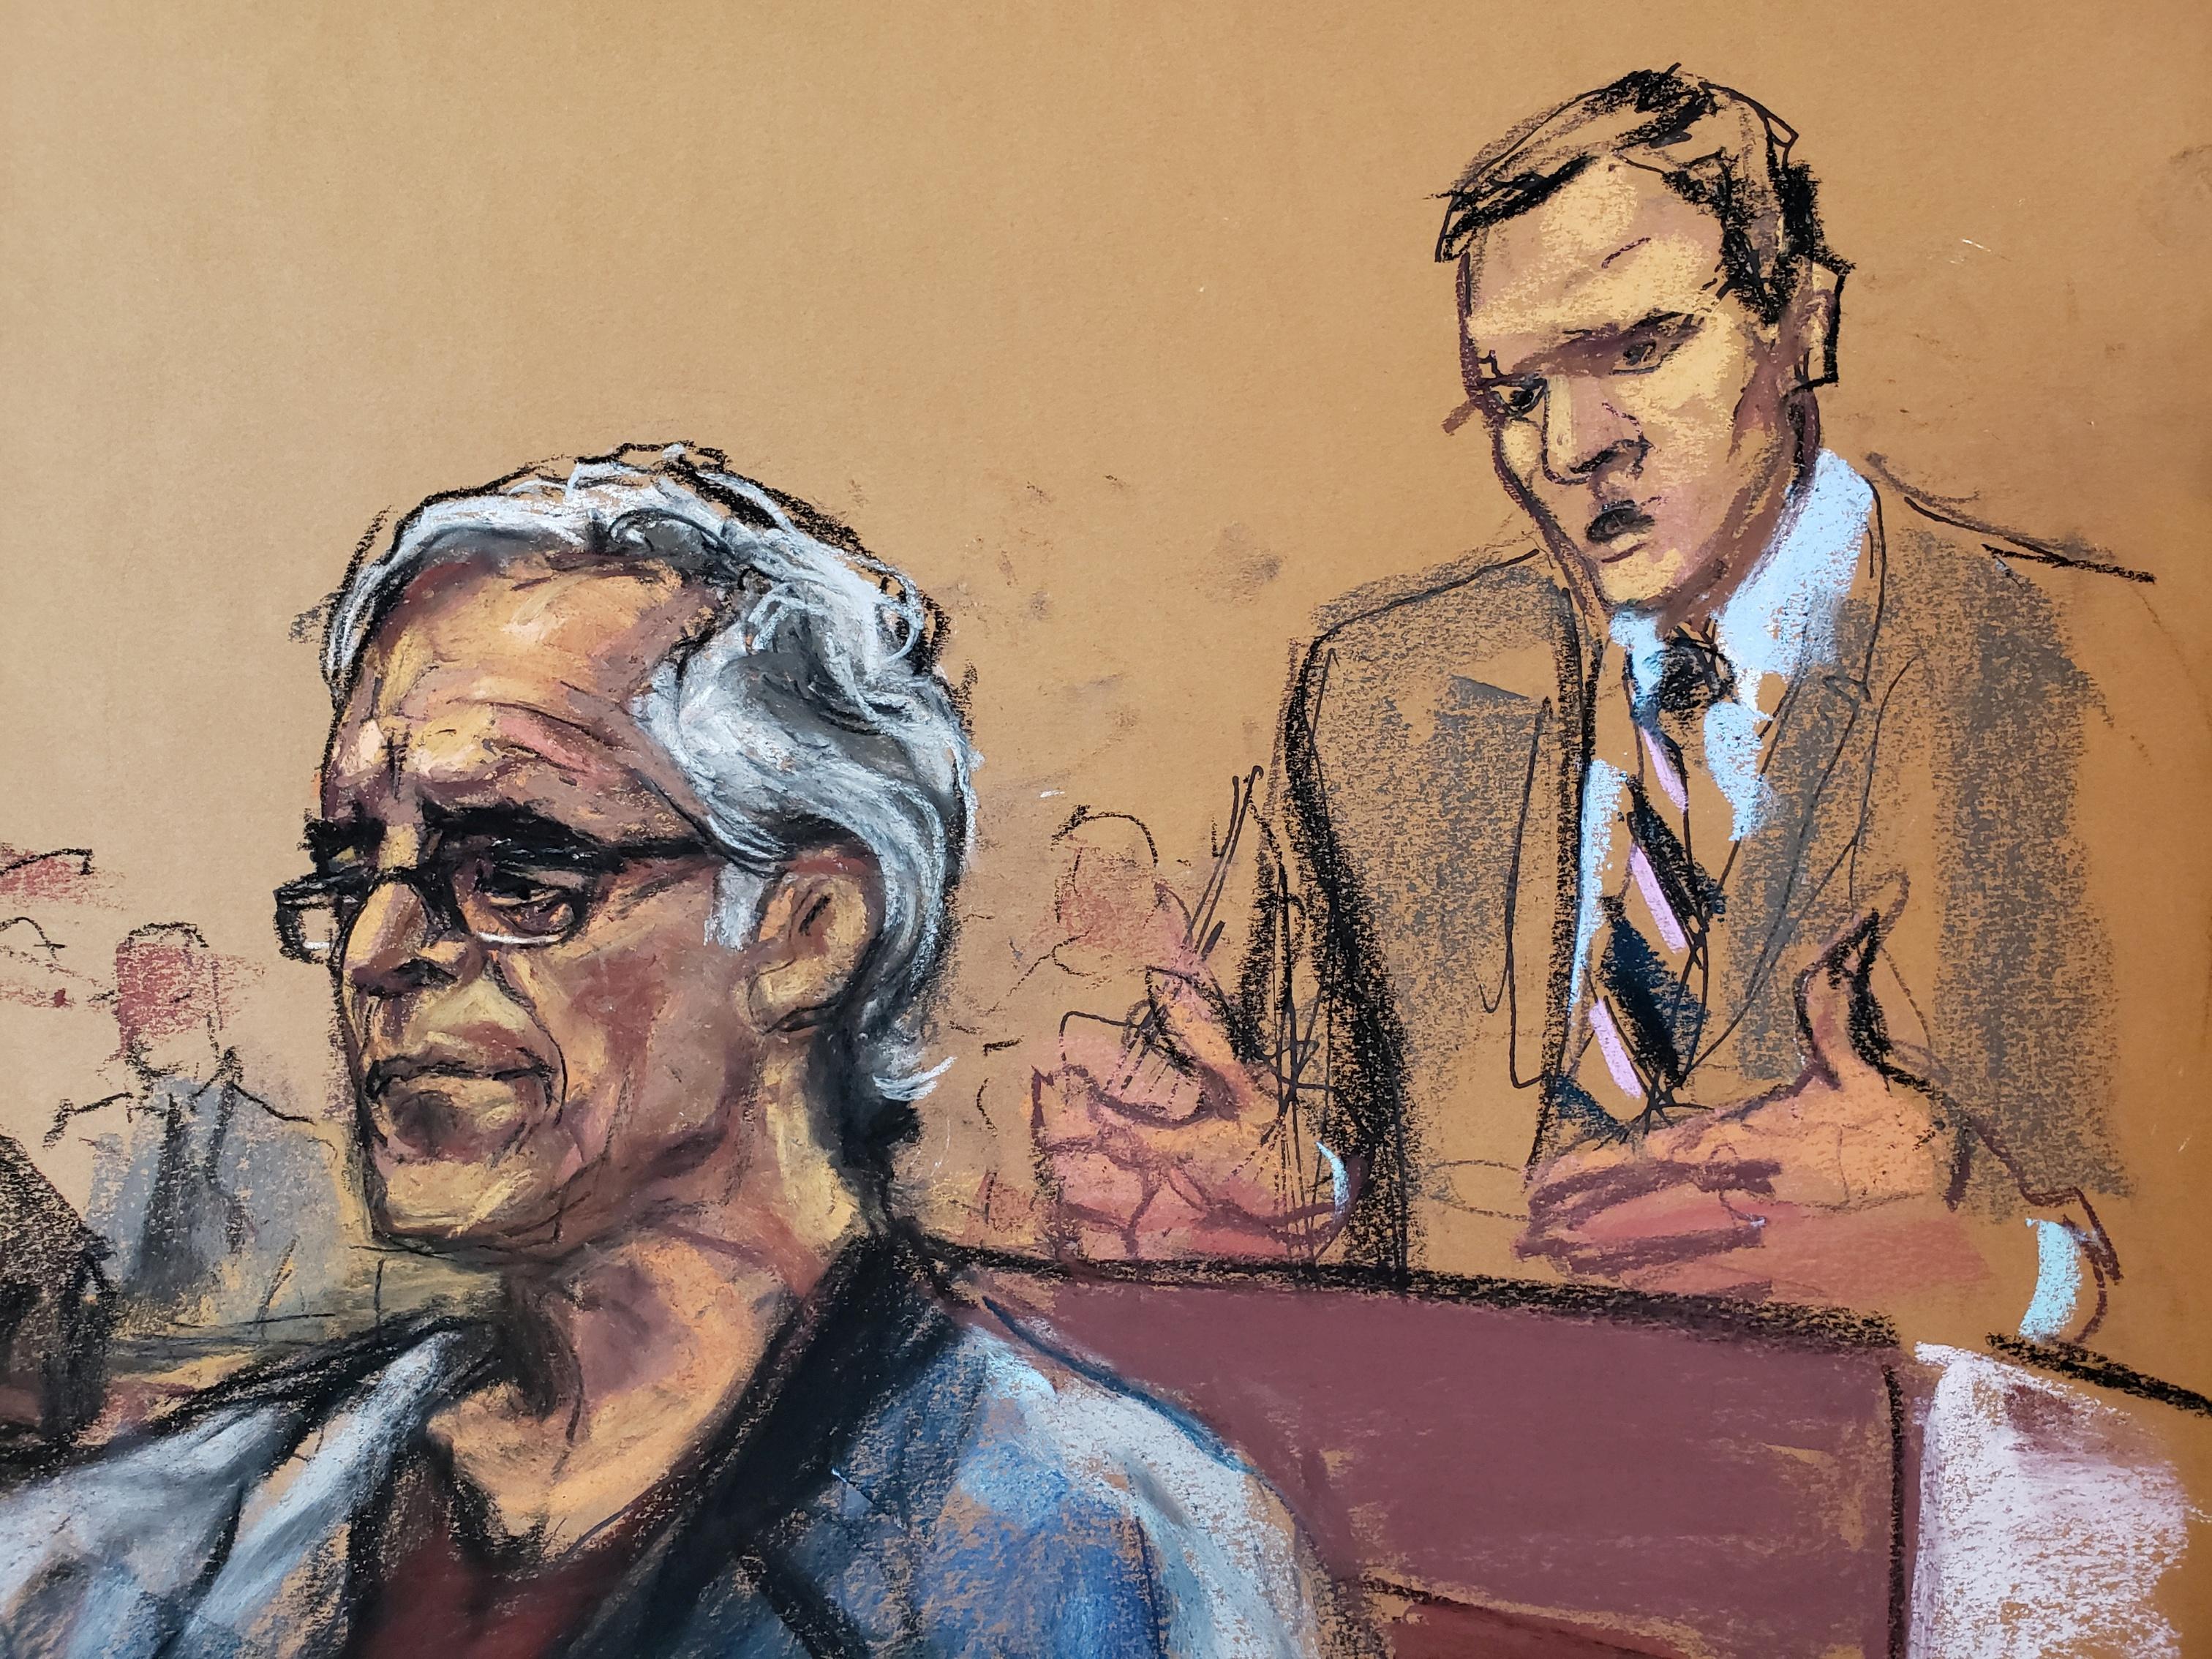 Assistant U.S. Attorney Alex Rossmiller (R) speaks as Jeffrey Epstein looks on during a a bail hearing in U.S. financier Jeffrey Epstein's sex trafficking case, in this court sketch in New York, U.S., July 15, 2019. REUTERS/Jane Rosenberg